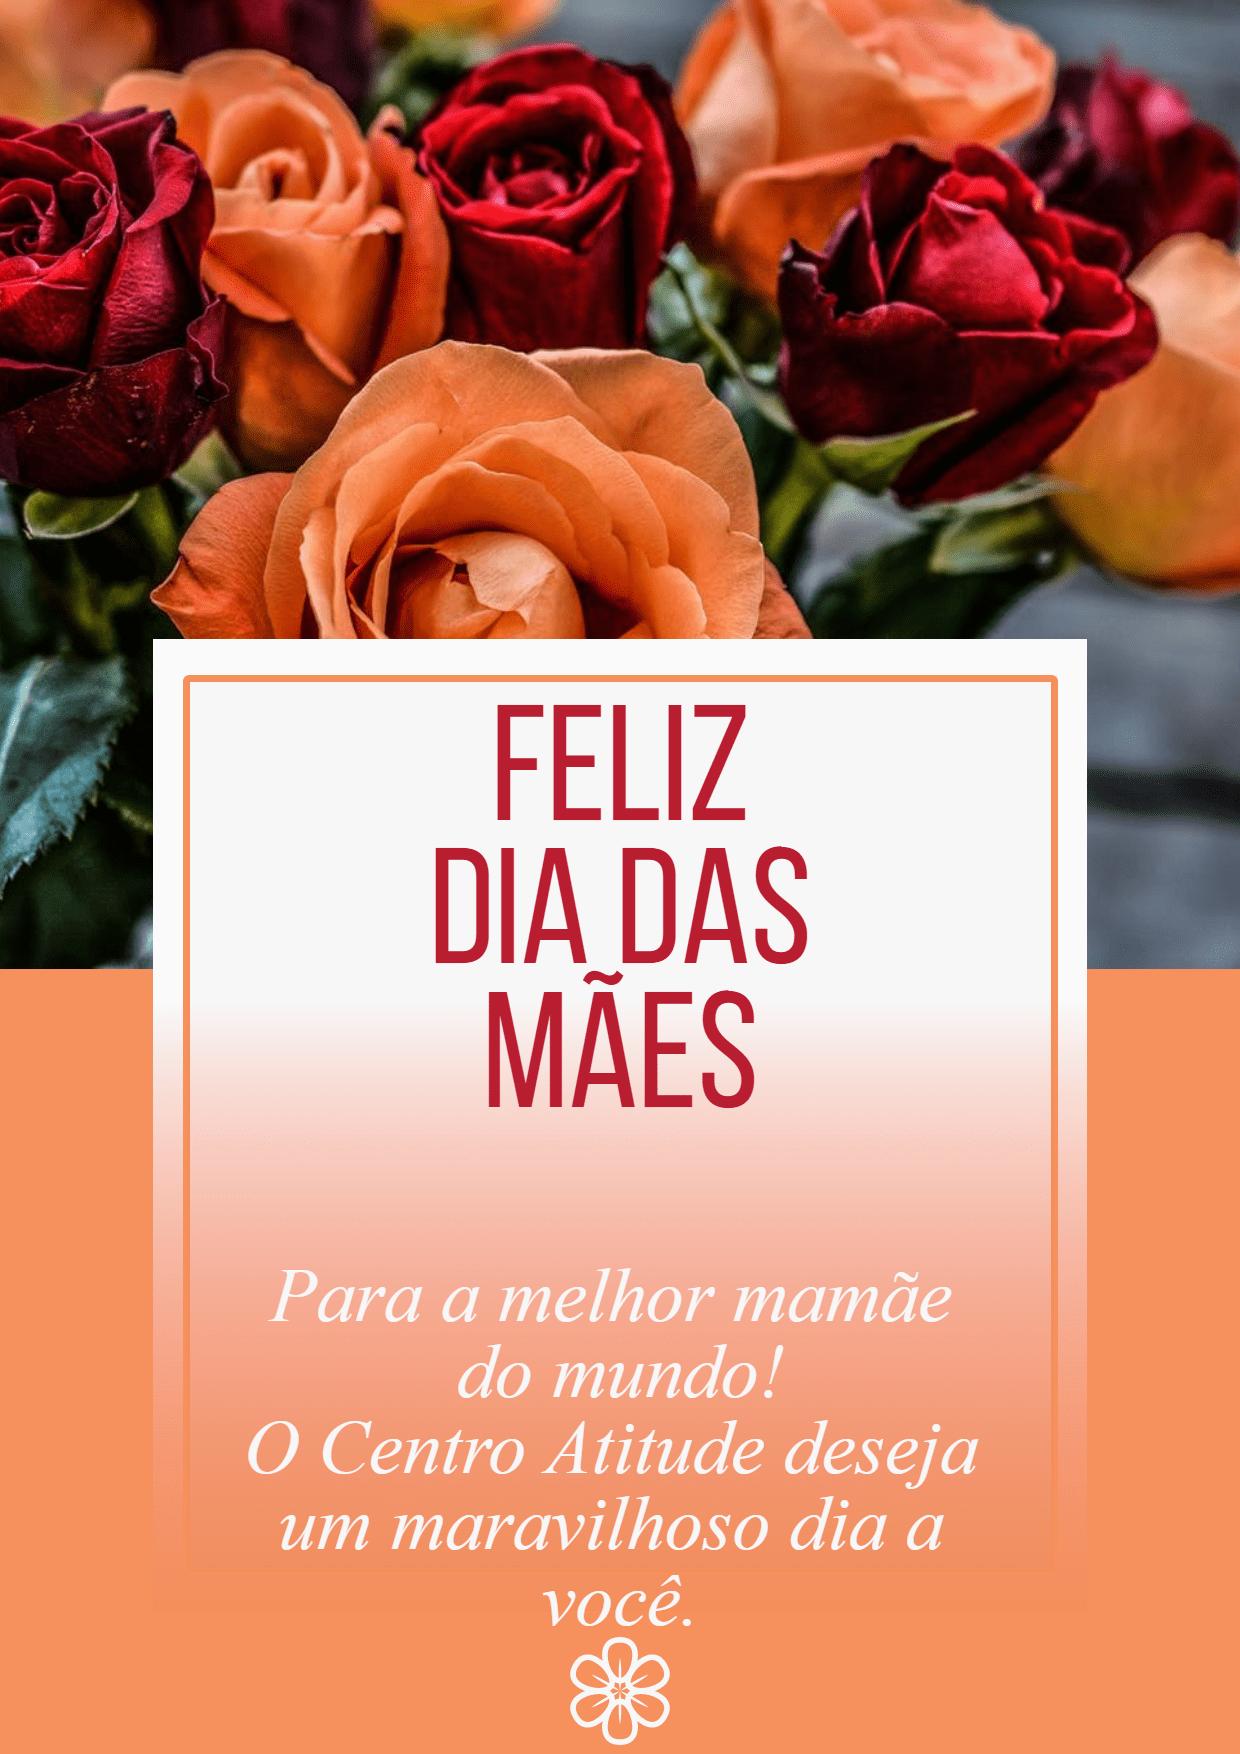 Flower, Rose, Orange, Garden, Roses, Arranging, Family, Floristry, Cut, Flowers, Petal, Order, Anniversary,  Free Image